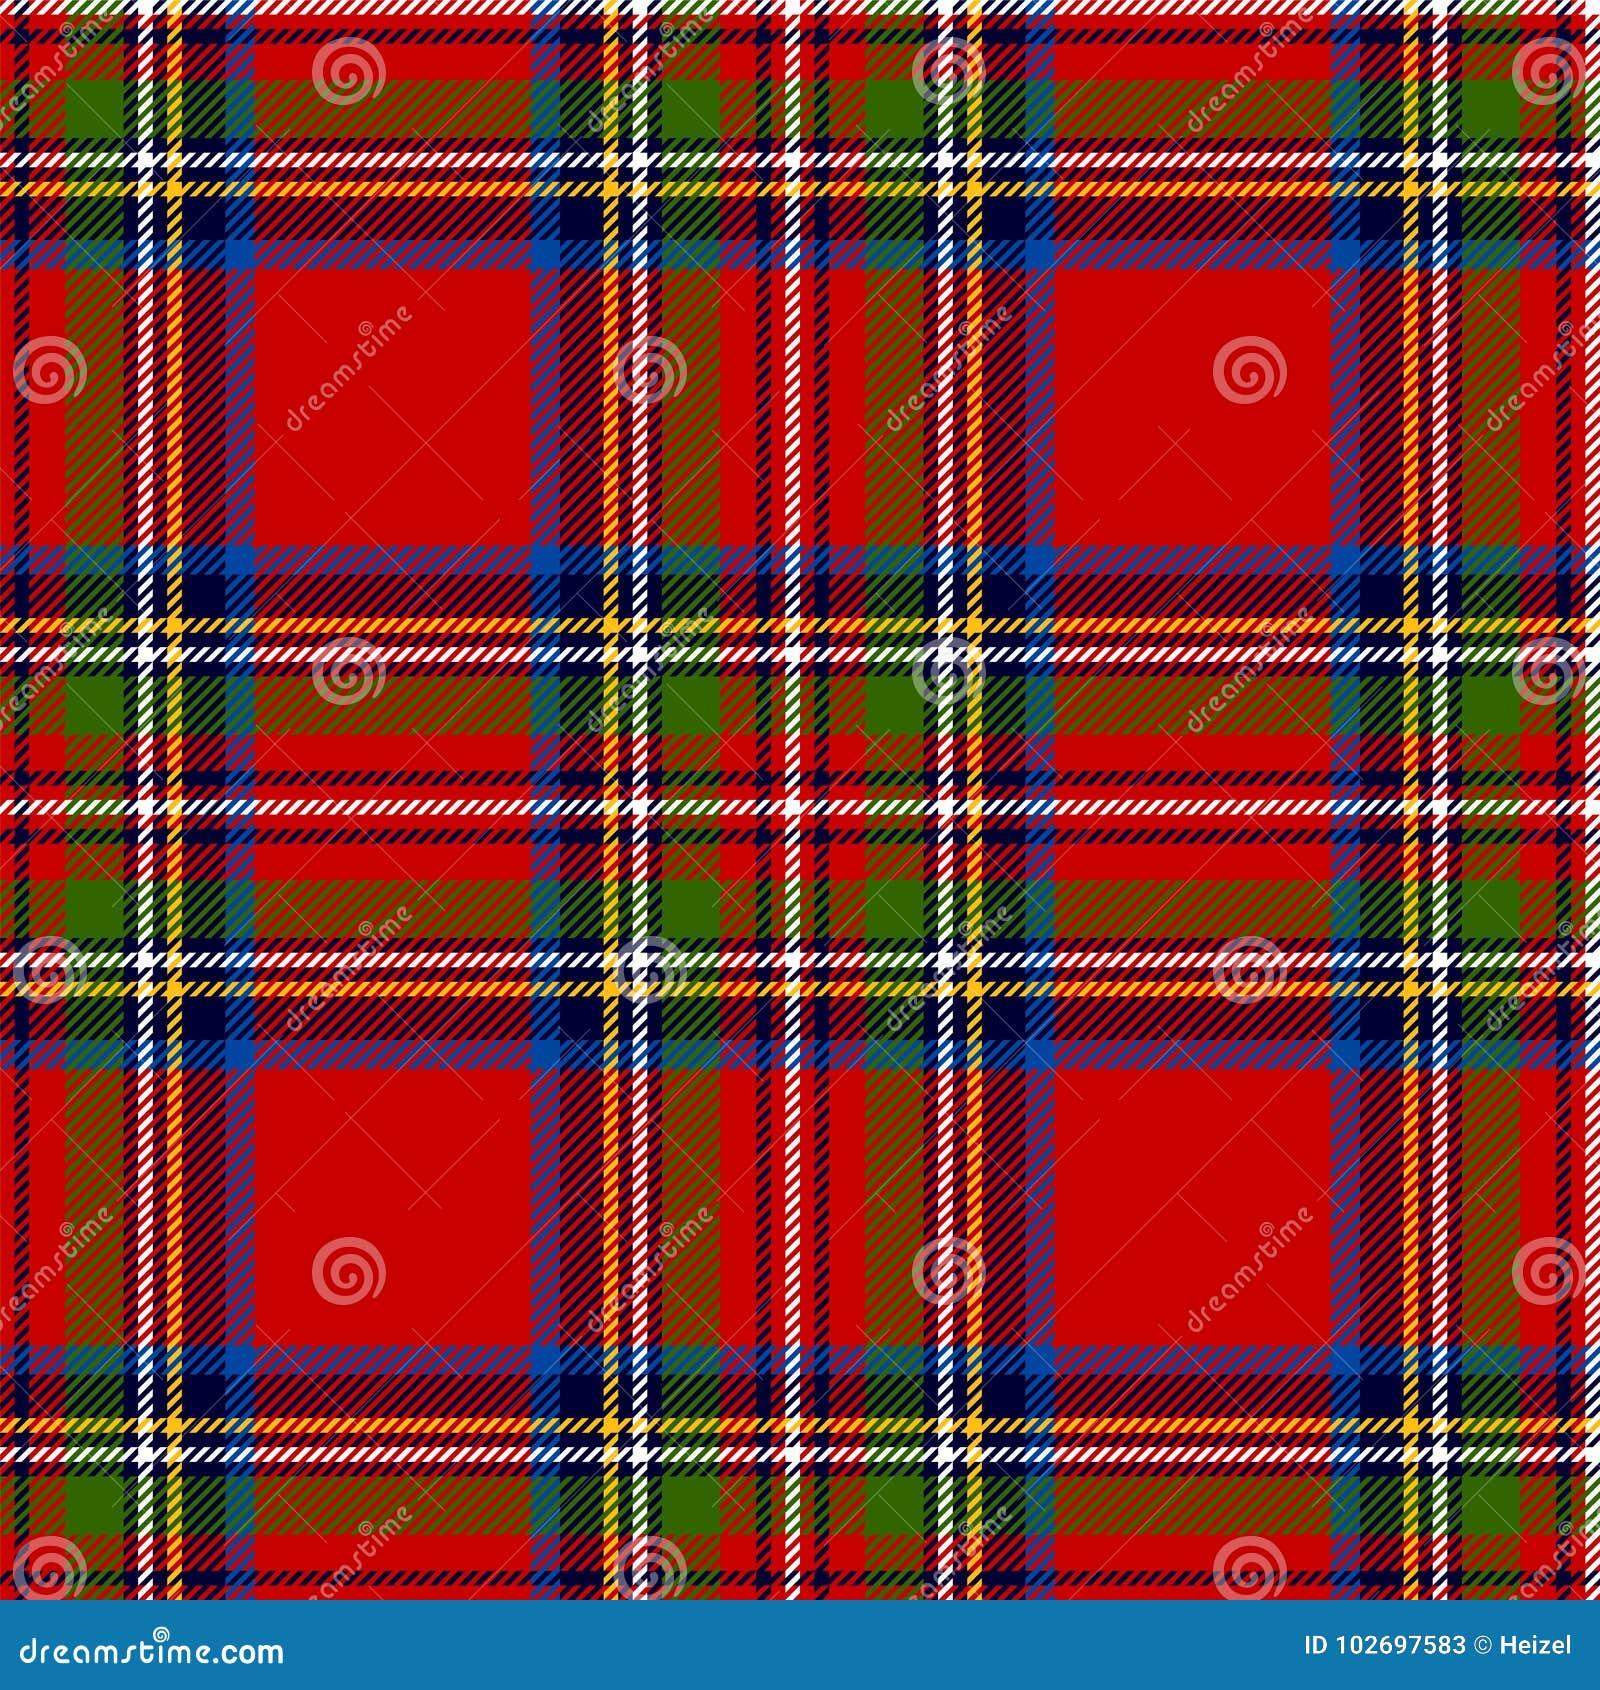 Schotse Geruite Wollen Stof.Schotse Plaid Het Koninklijke Geruite Schotse Wollen Stof